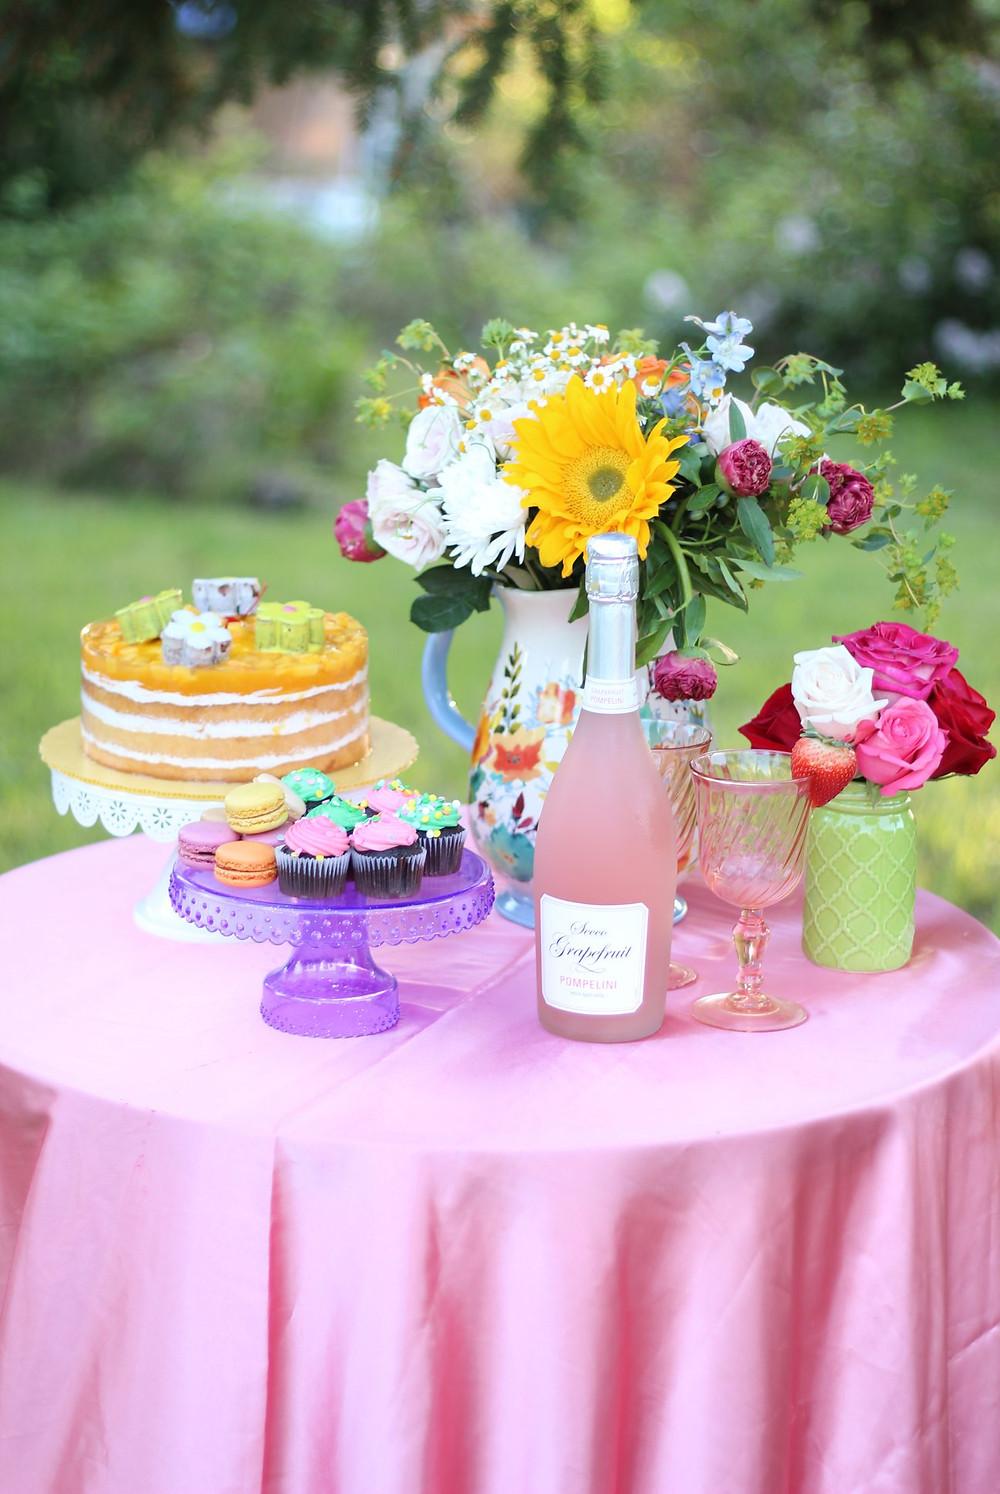 Mother's day garden party decor